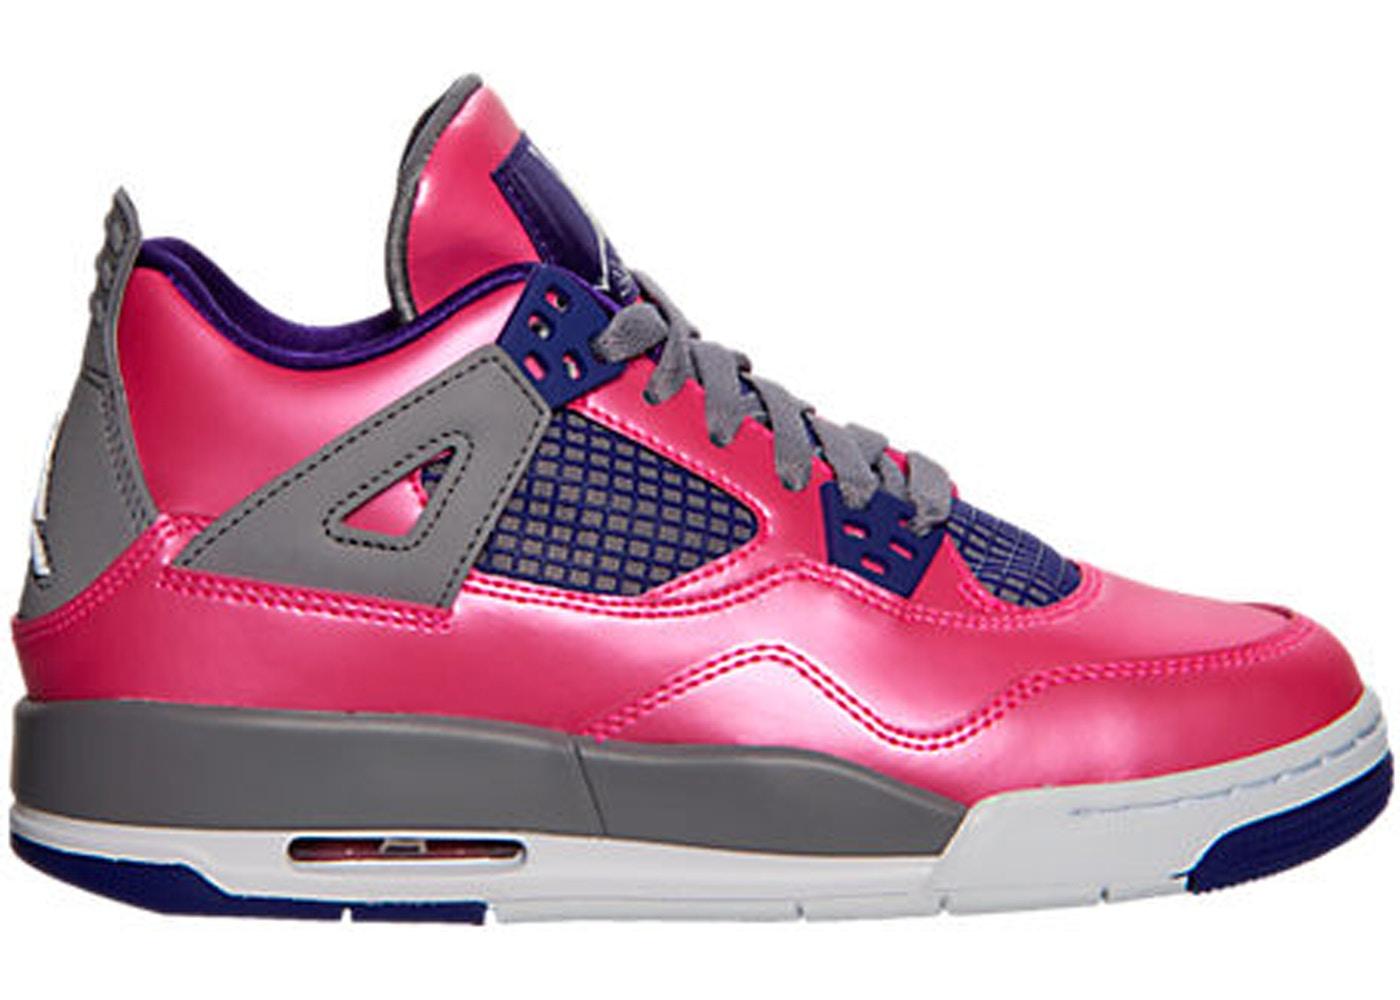 11efdba1f8c2b0 Jordan 4 Retro Pink Foil (GS) - 487724-607